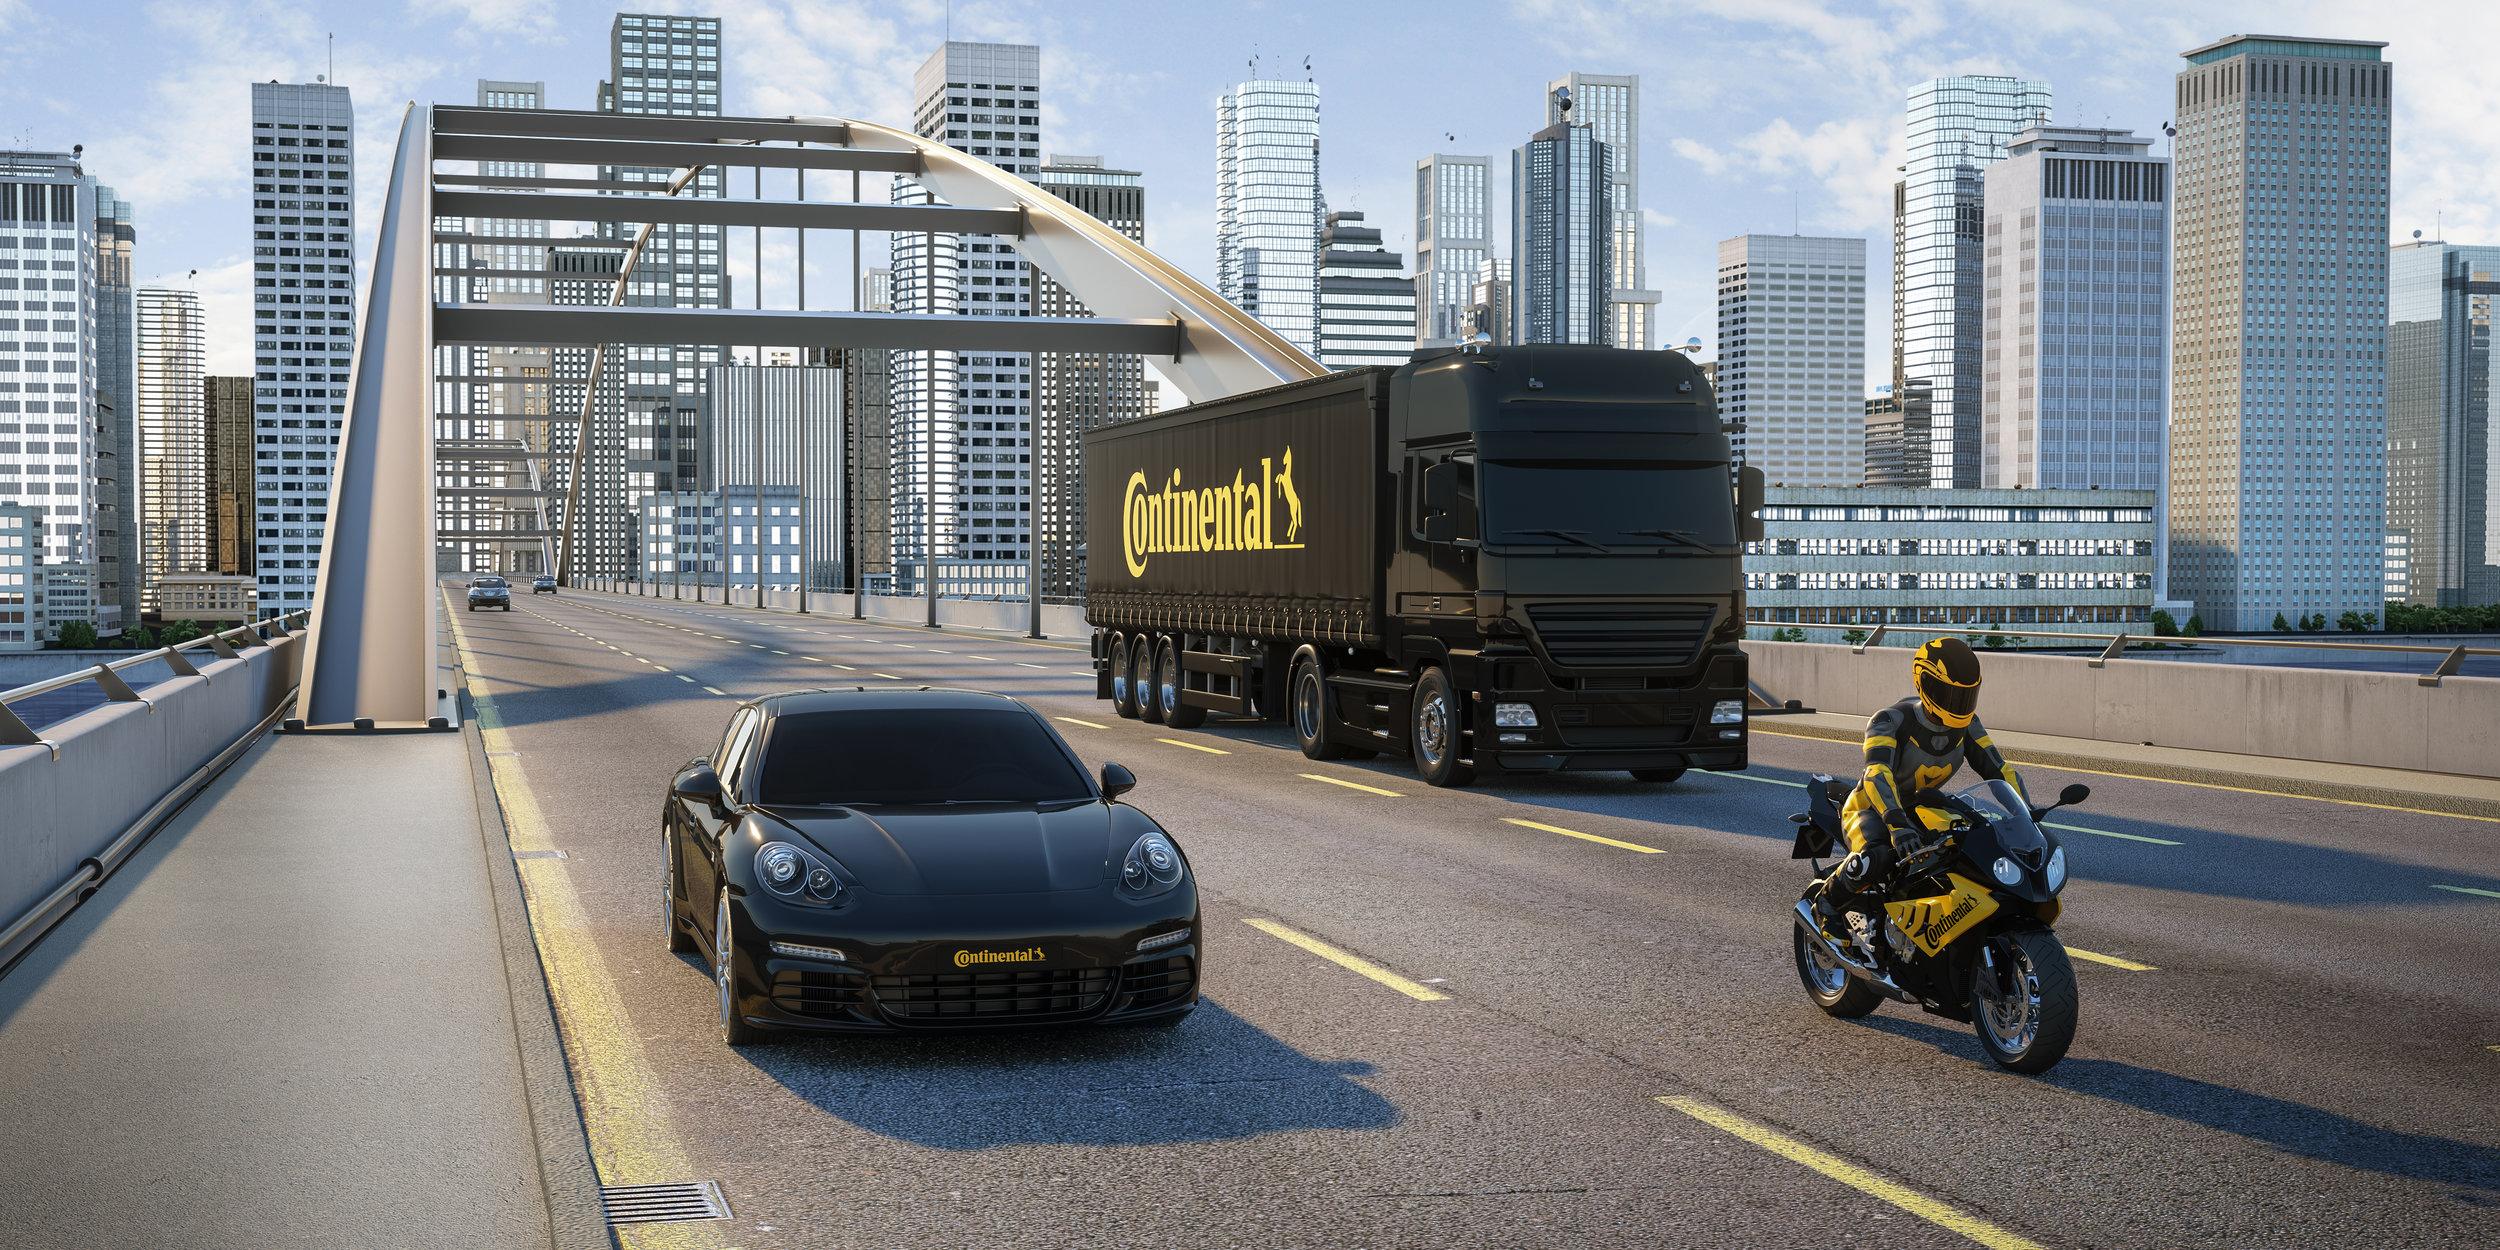 Continental thumbnail.jpg